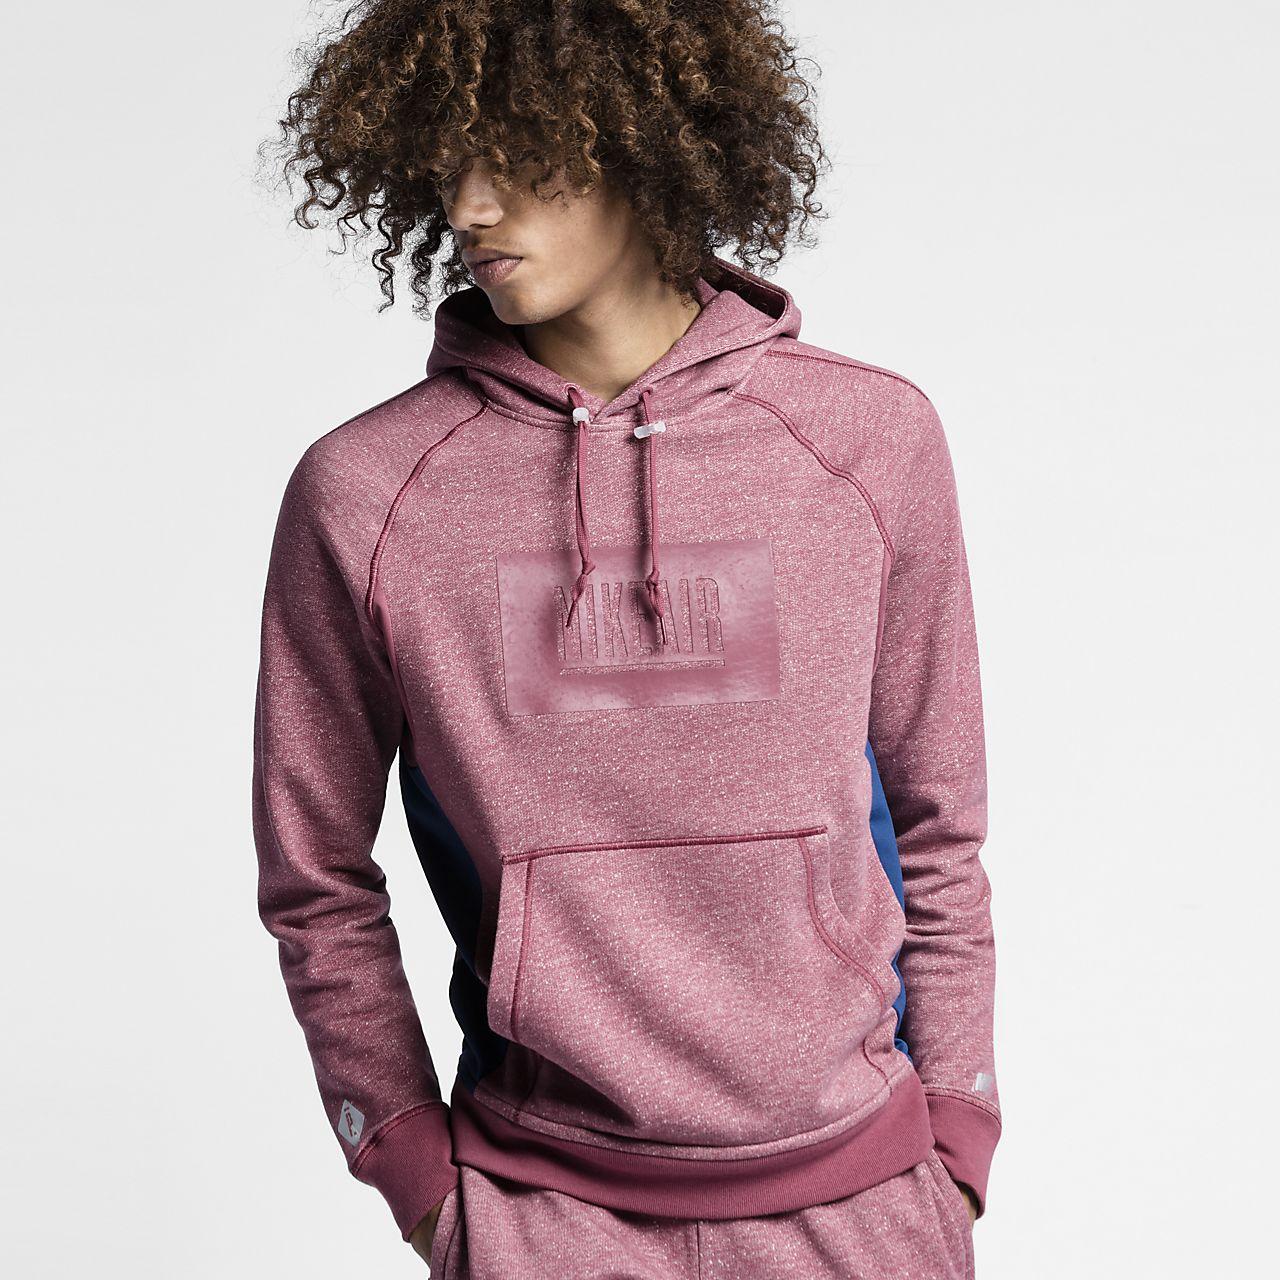 NikeLab x Pigalle 连帽衫